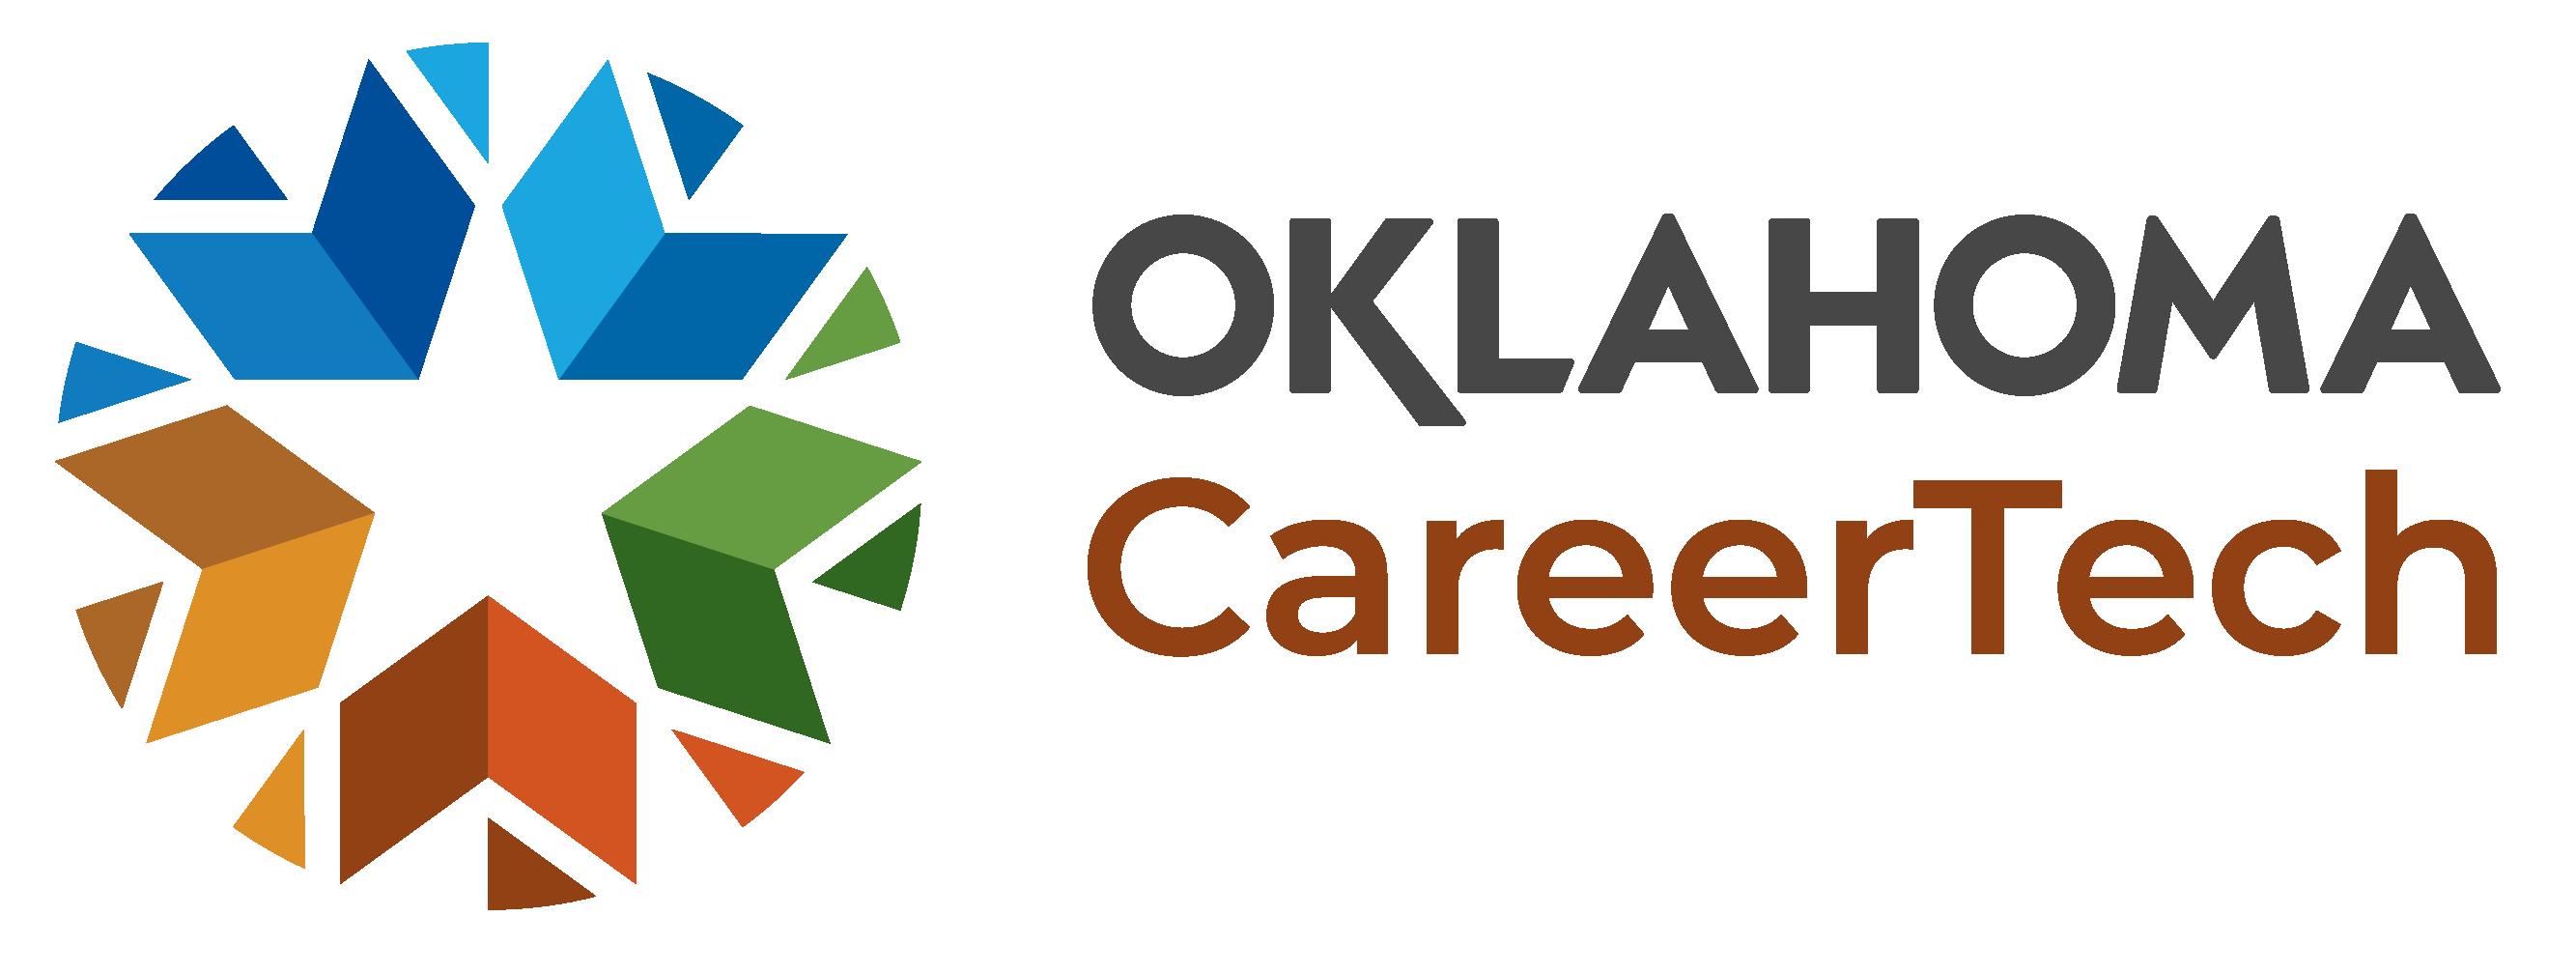 Oklahoma CareerTech Logo